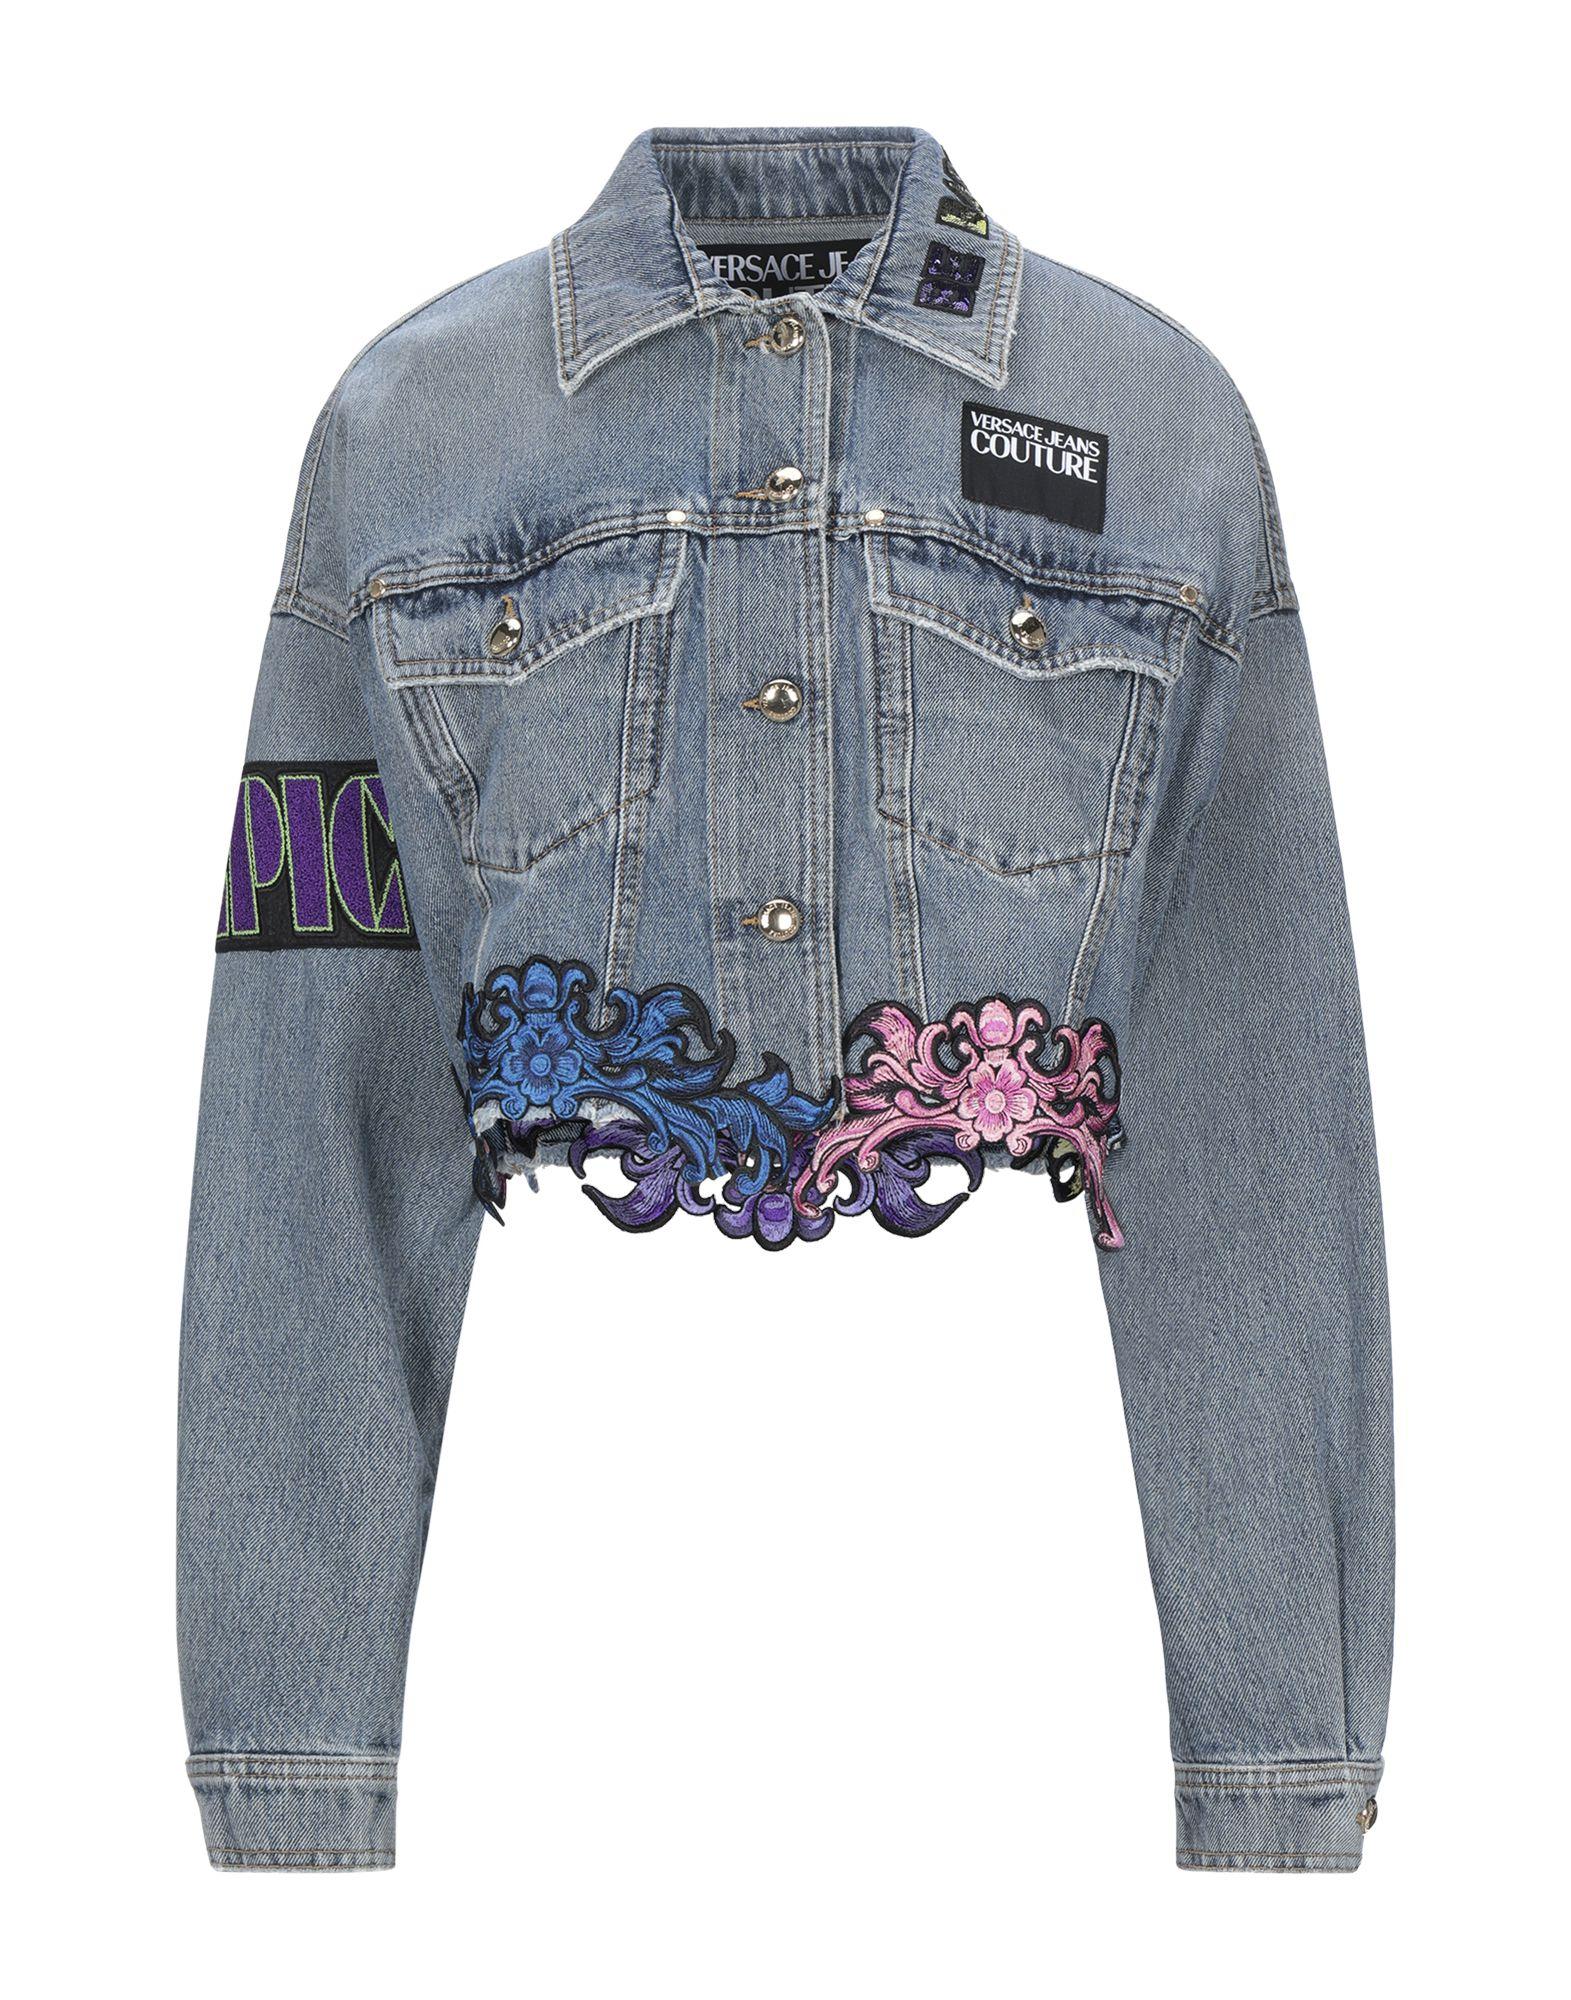 VERSACE JEANS COUTURE Джинсовая верхняя одежда versace jeans couture джинсовая верхняя одежда